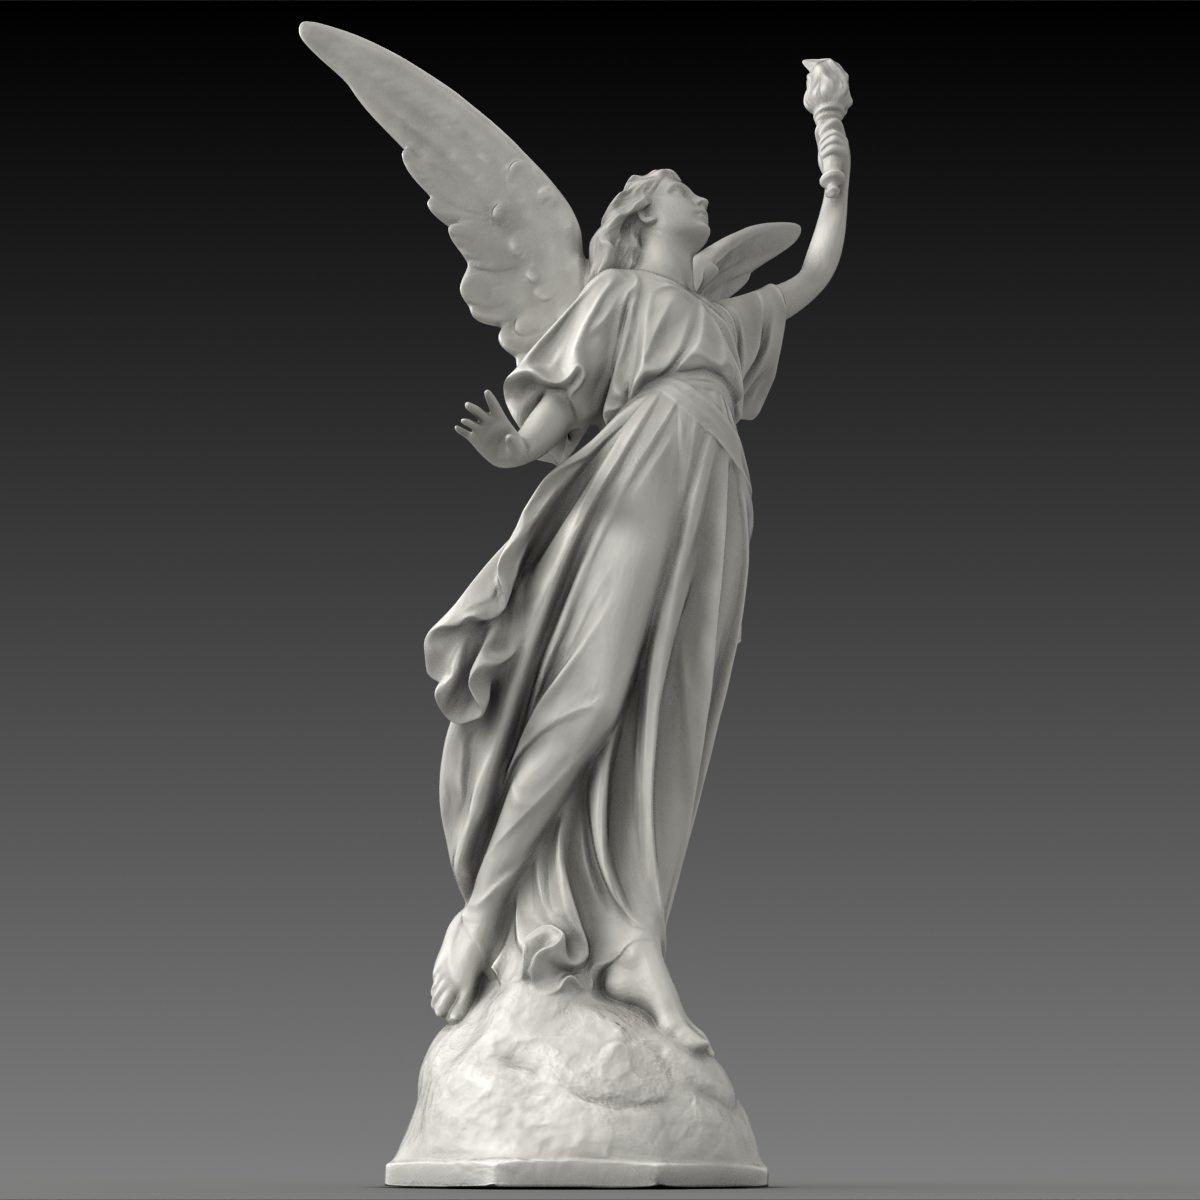 Lucy A Christian Angel Statue Free 3D Model .max .obj .fbx